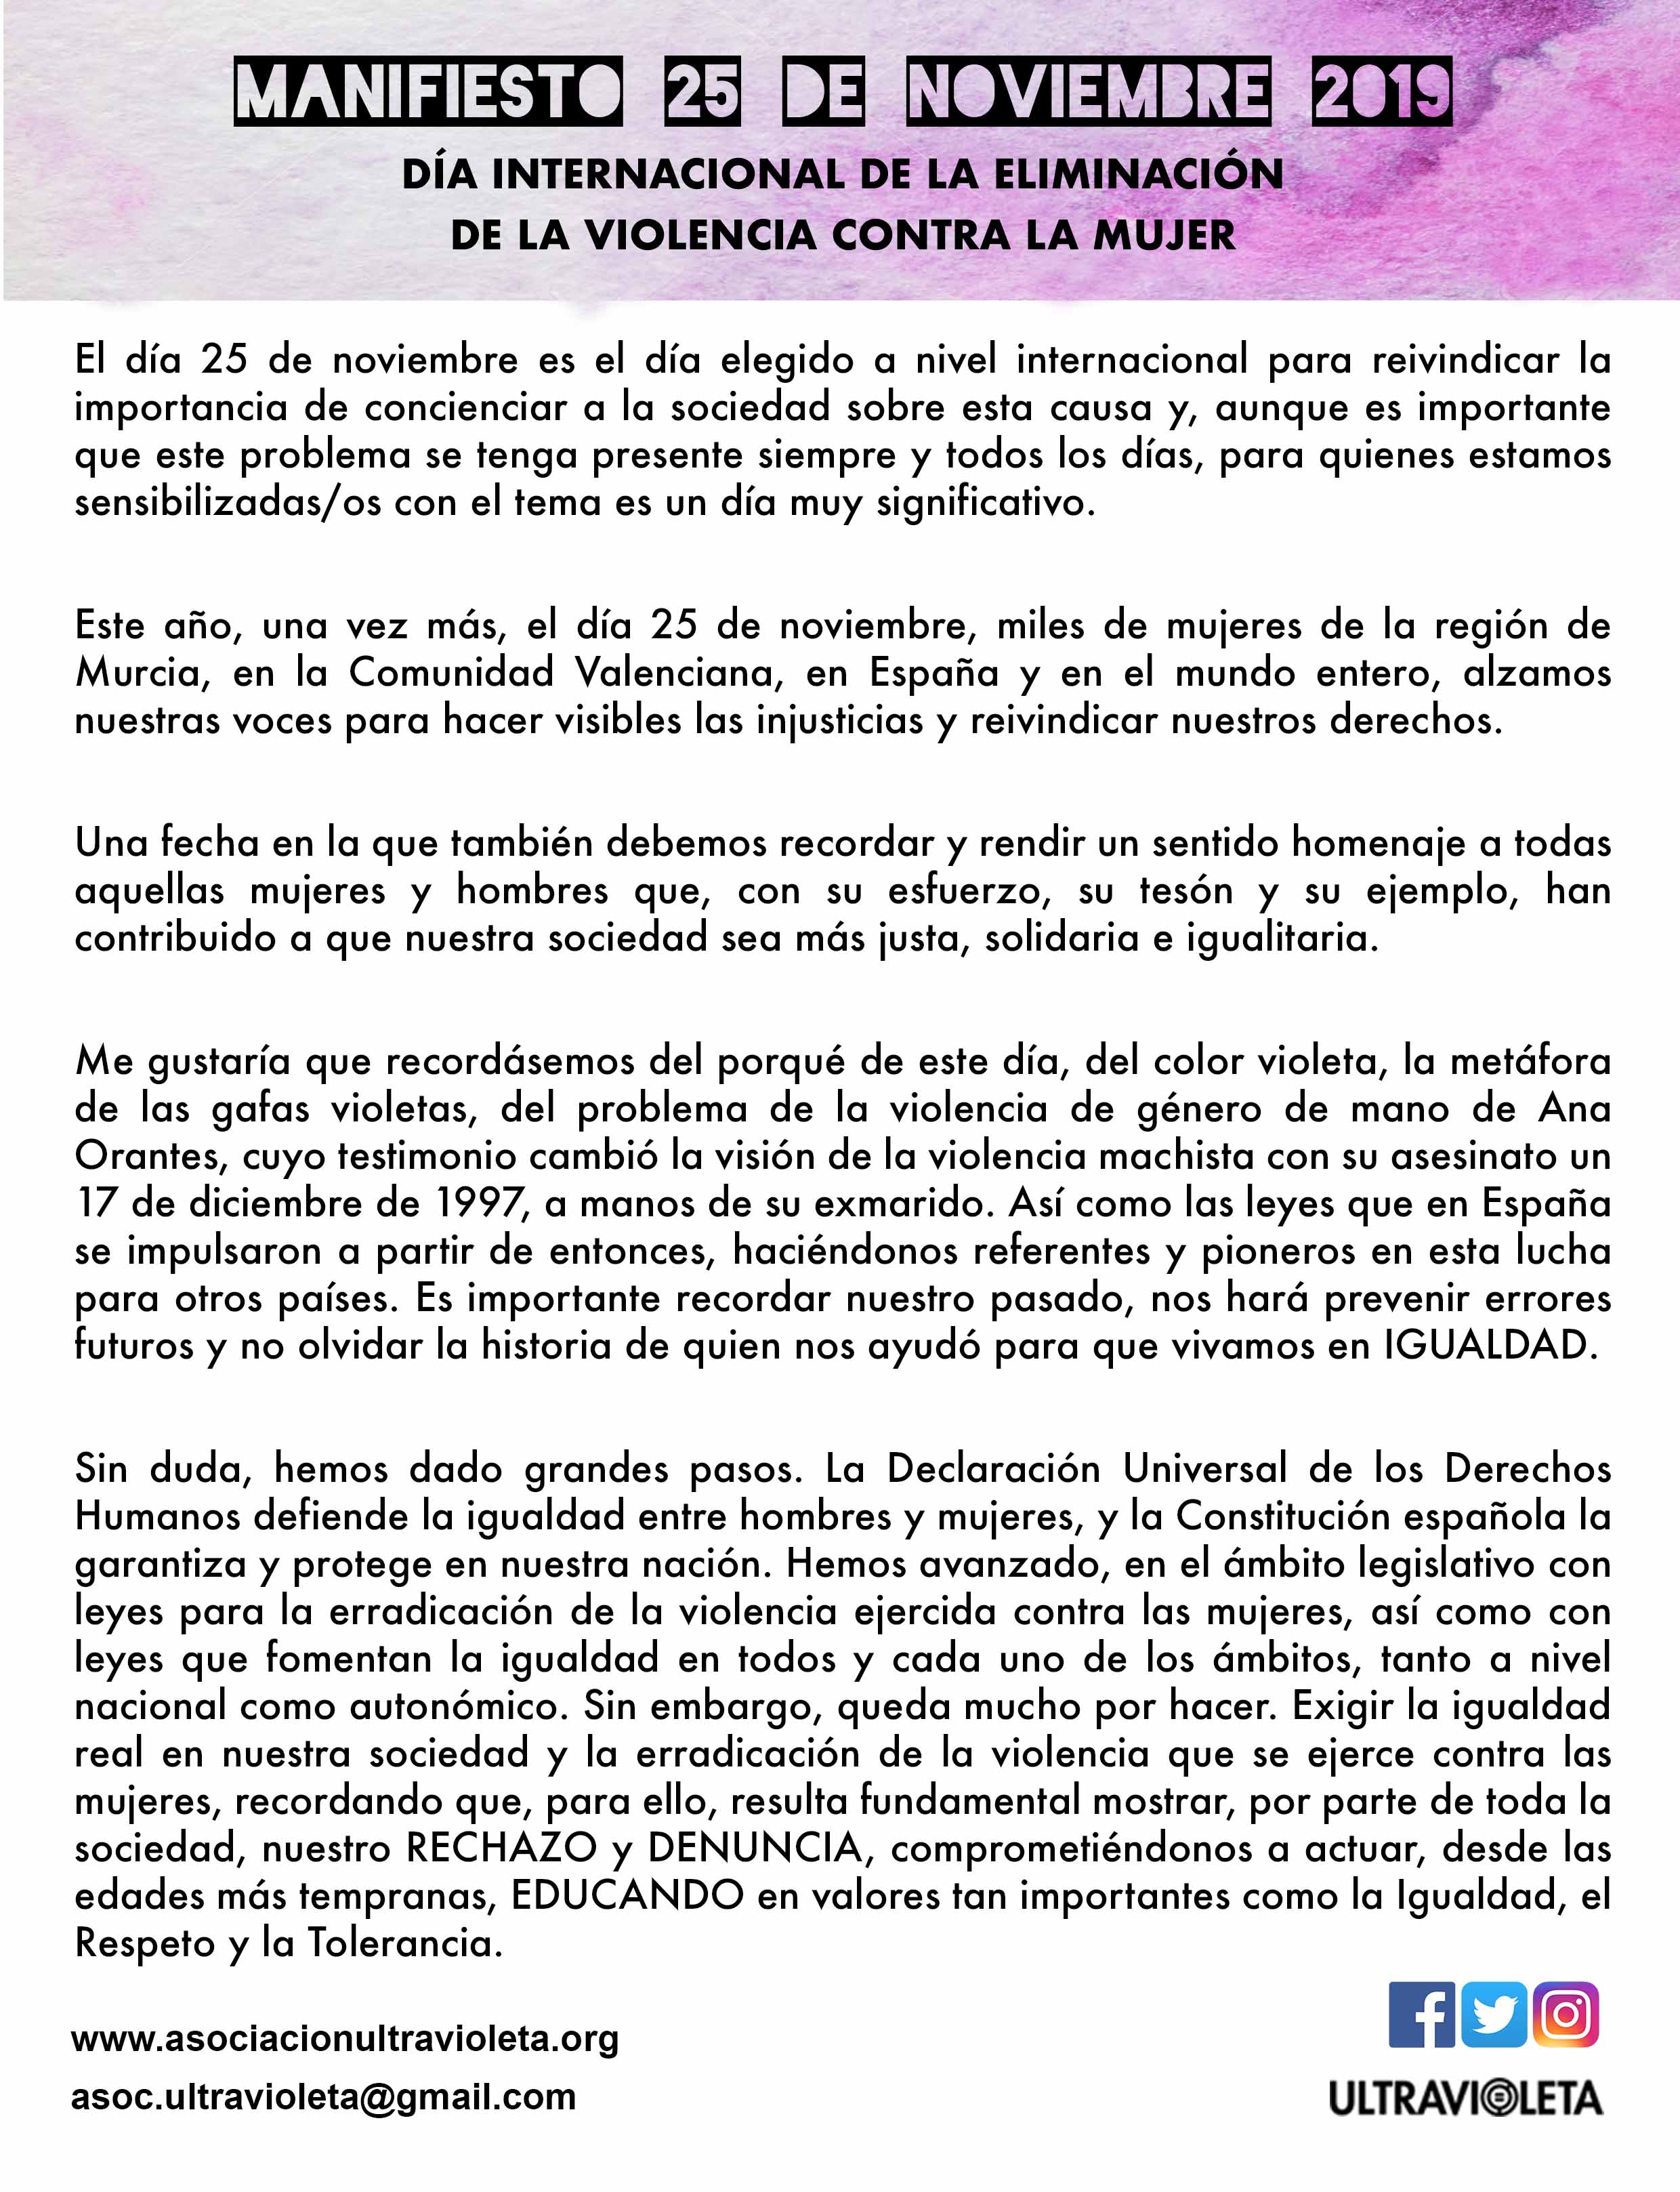 caramanifiesto2019insta